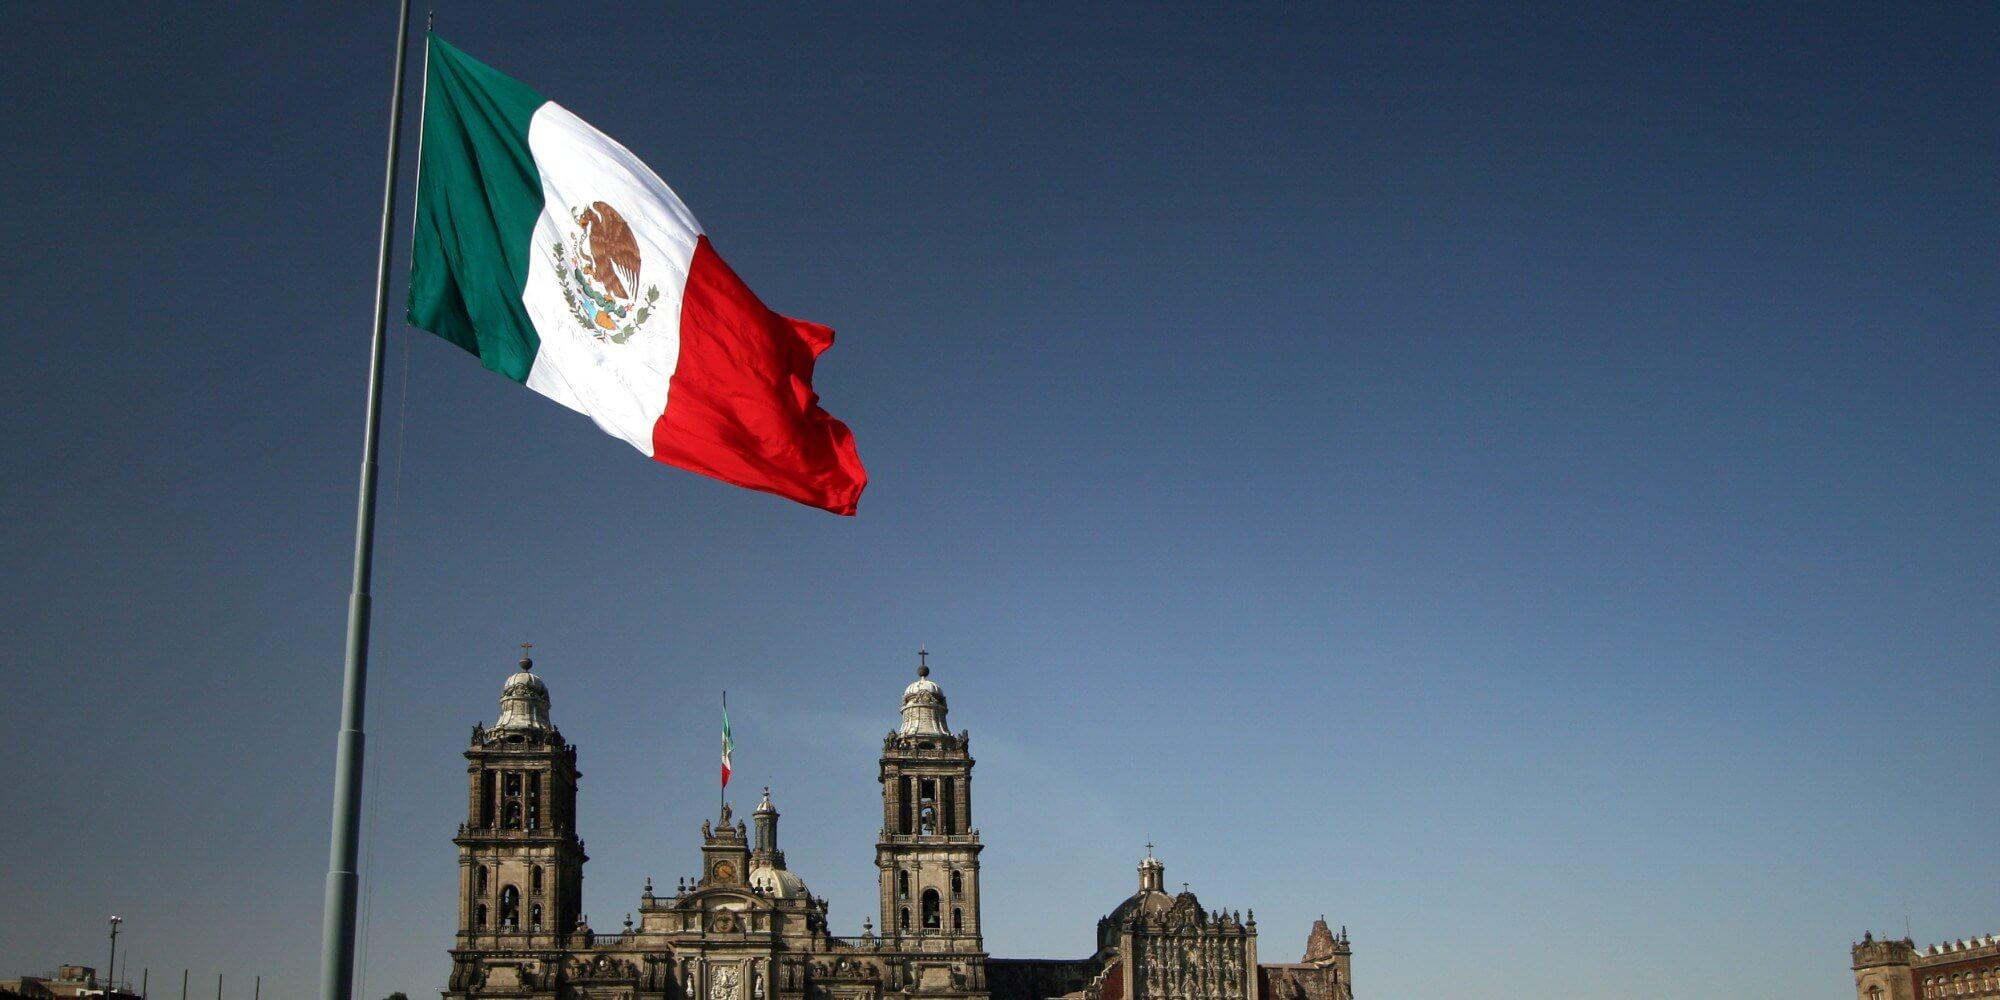 Мексика принимает закон о регулировании криптовалют